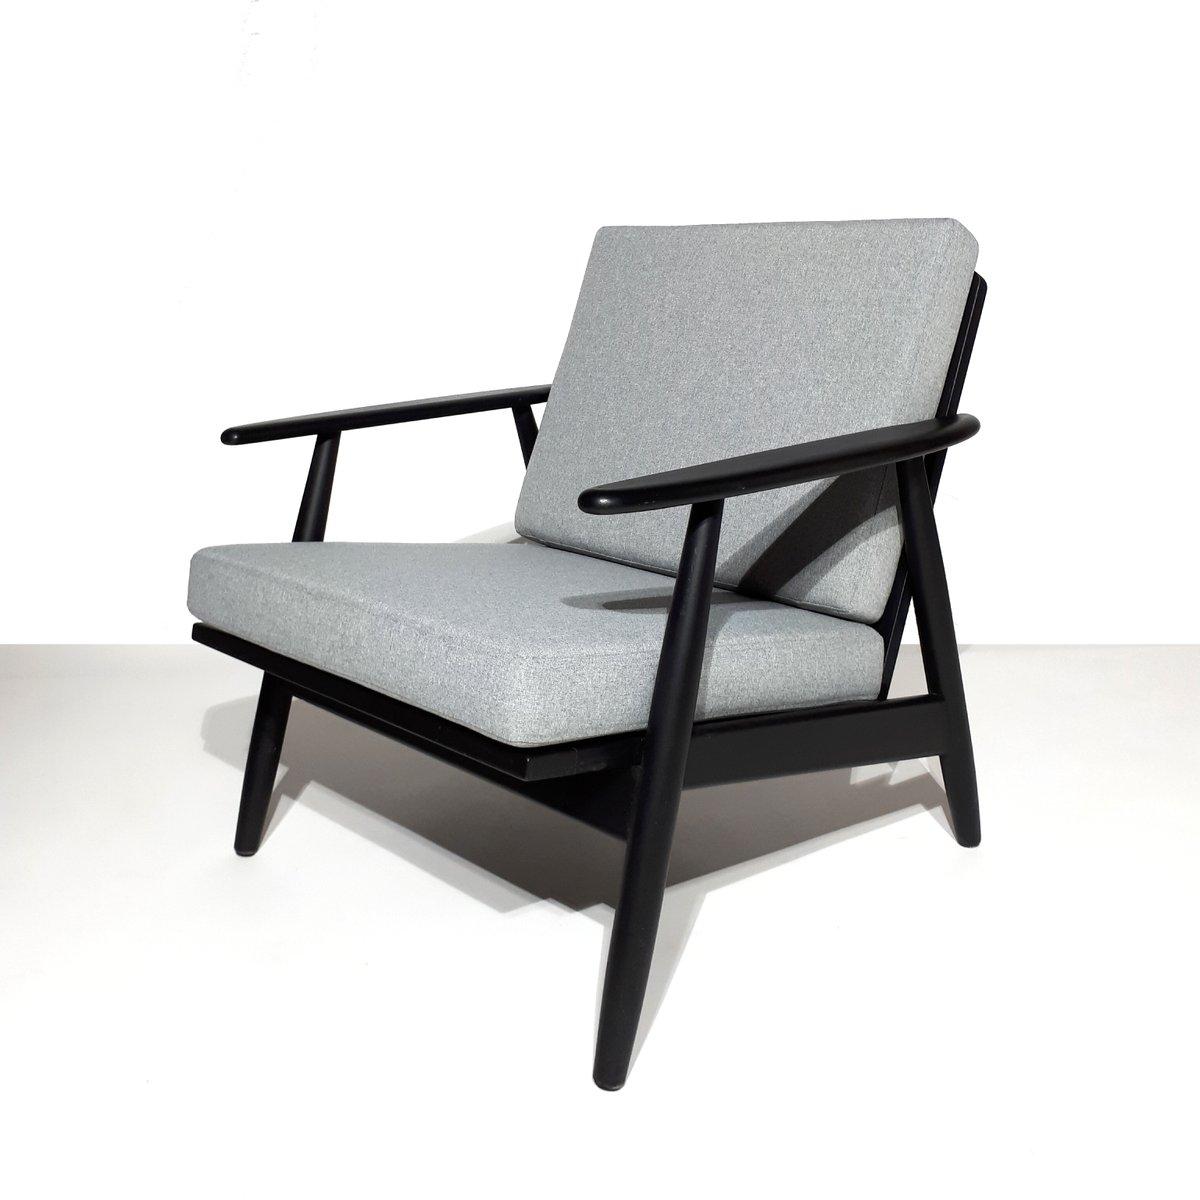 Dänischer Mid-Century Sessel, 1960er